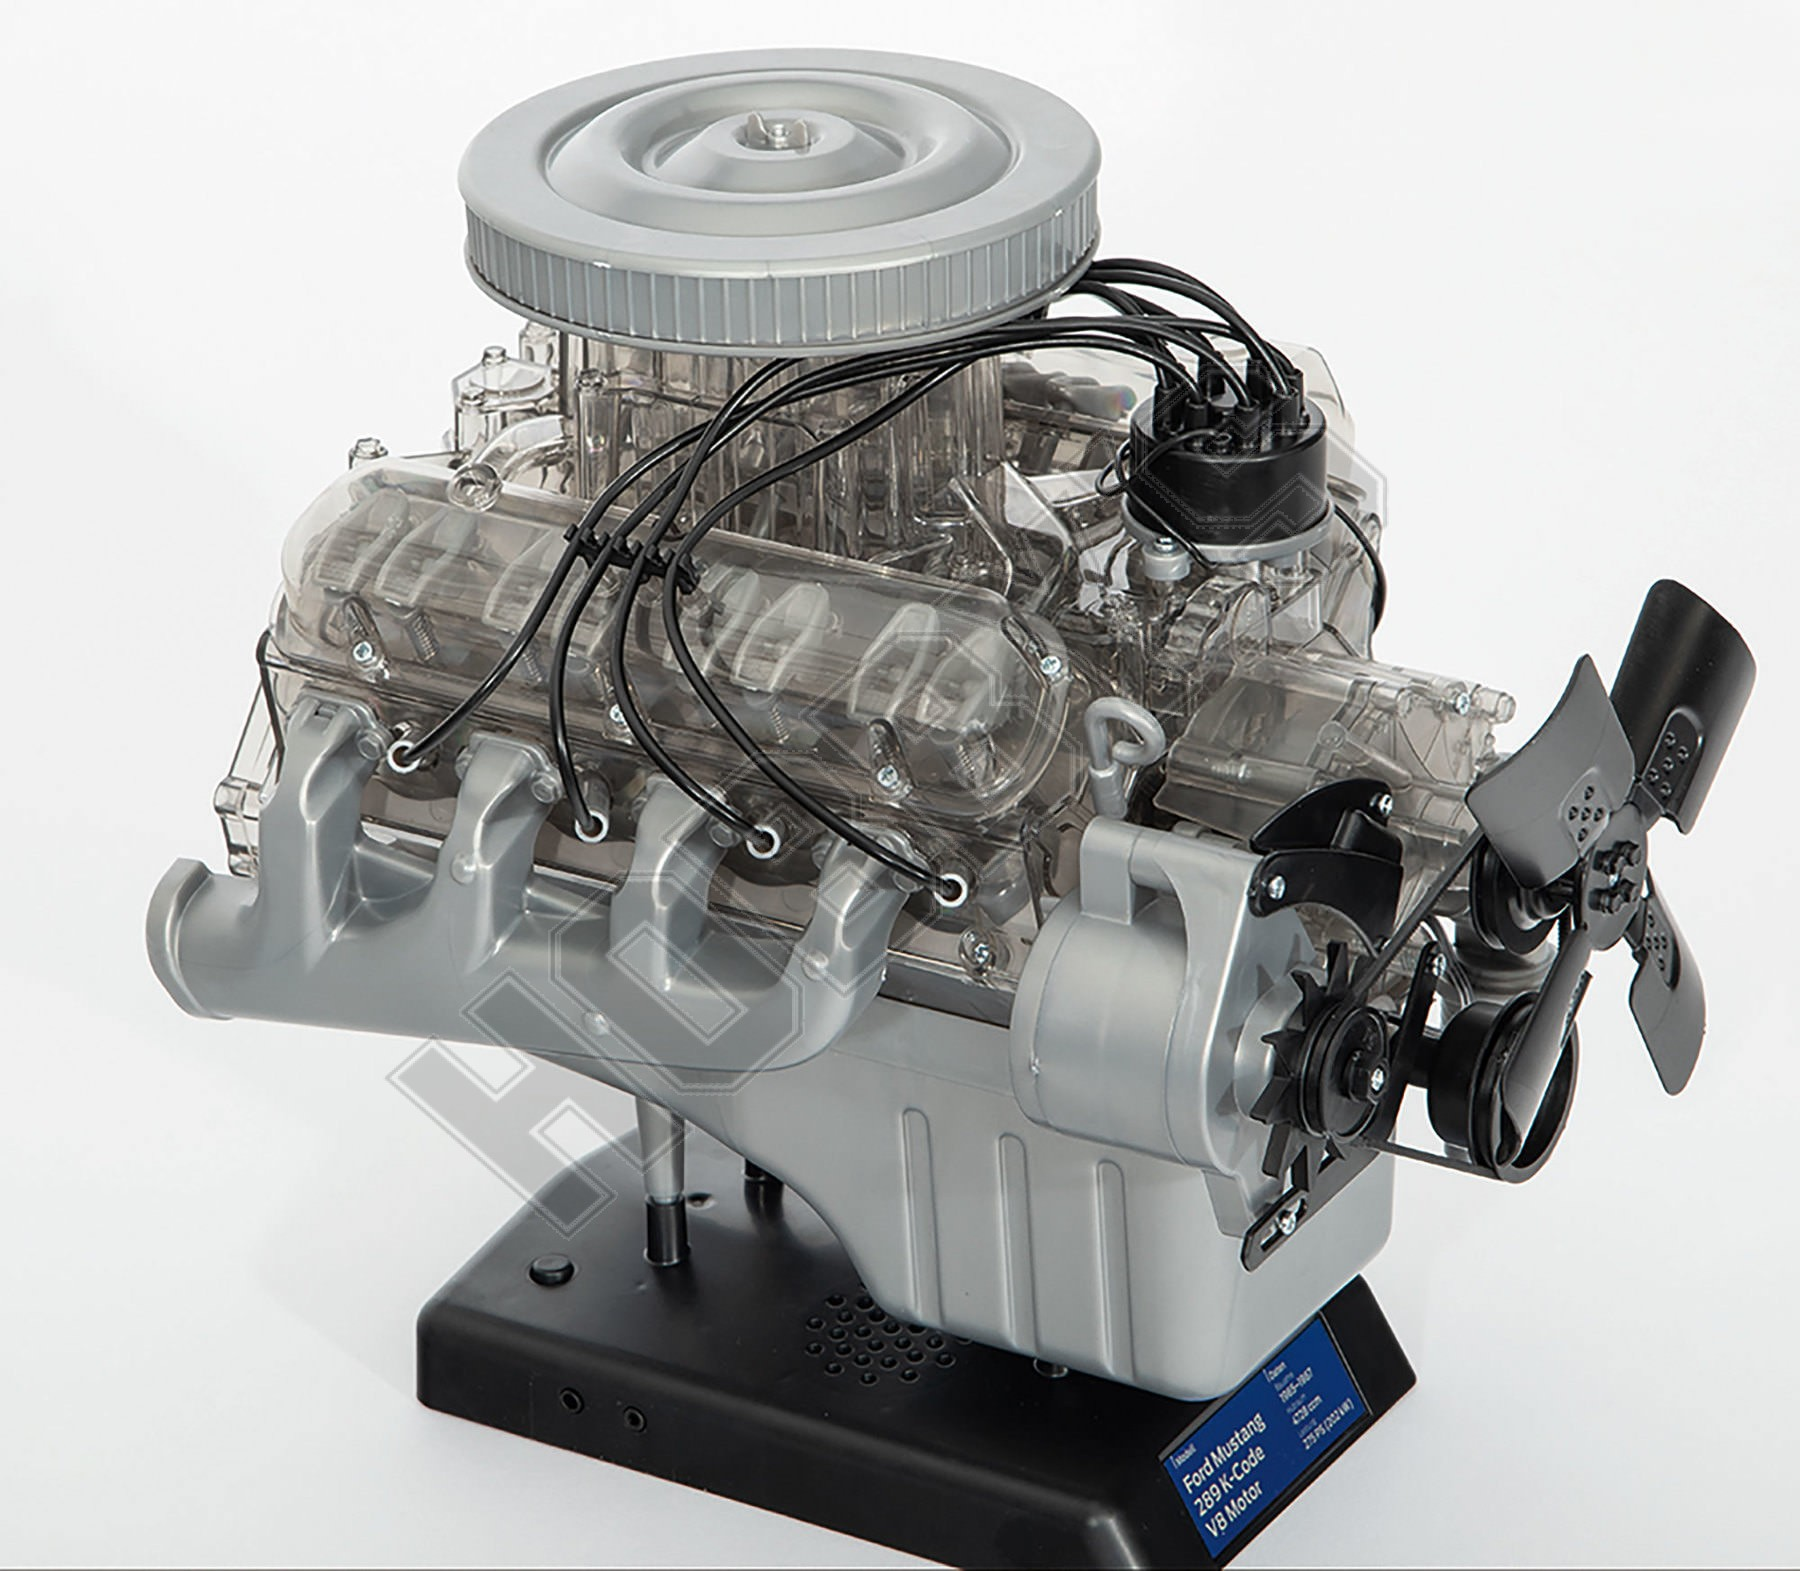 Ford Mustang V8 Model Engine 1